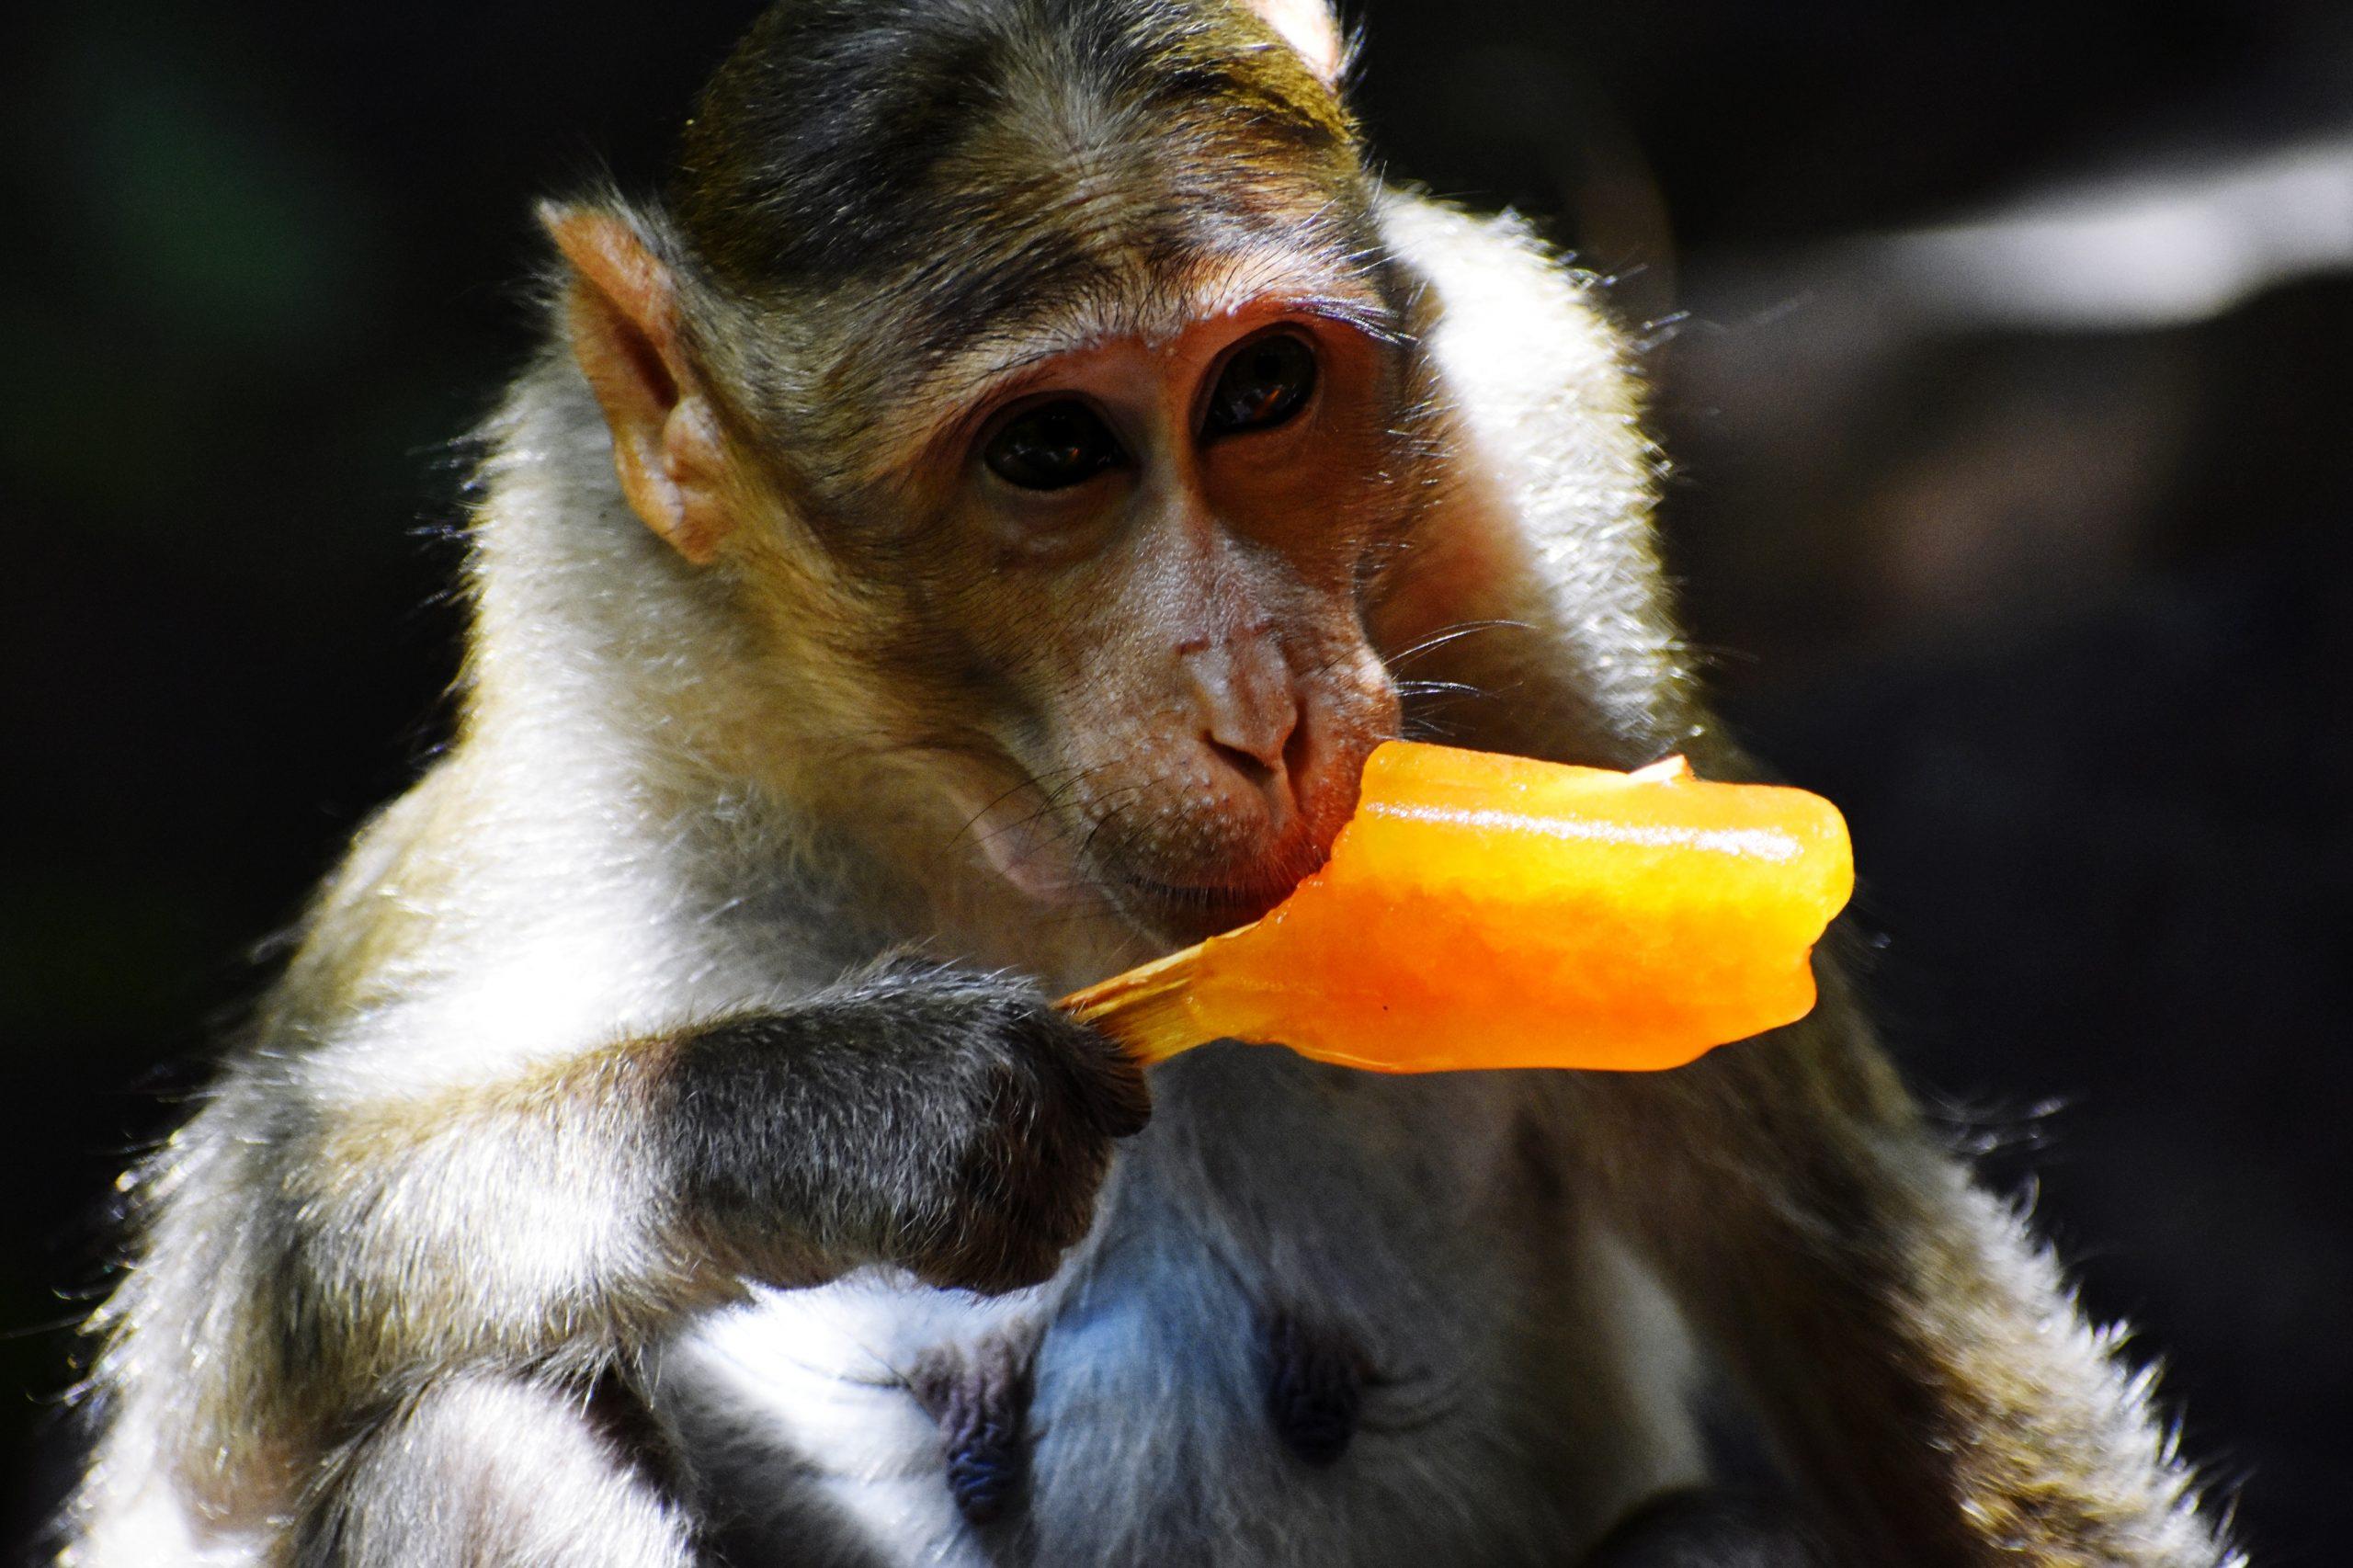 A monkey eating an ice pop